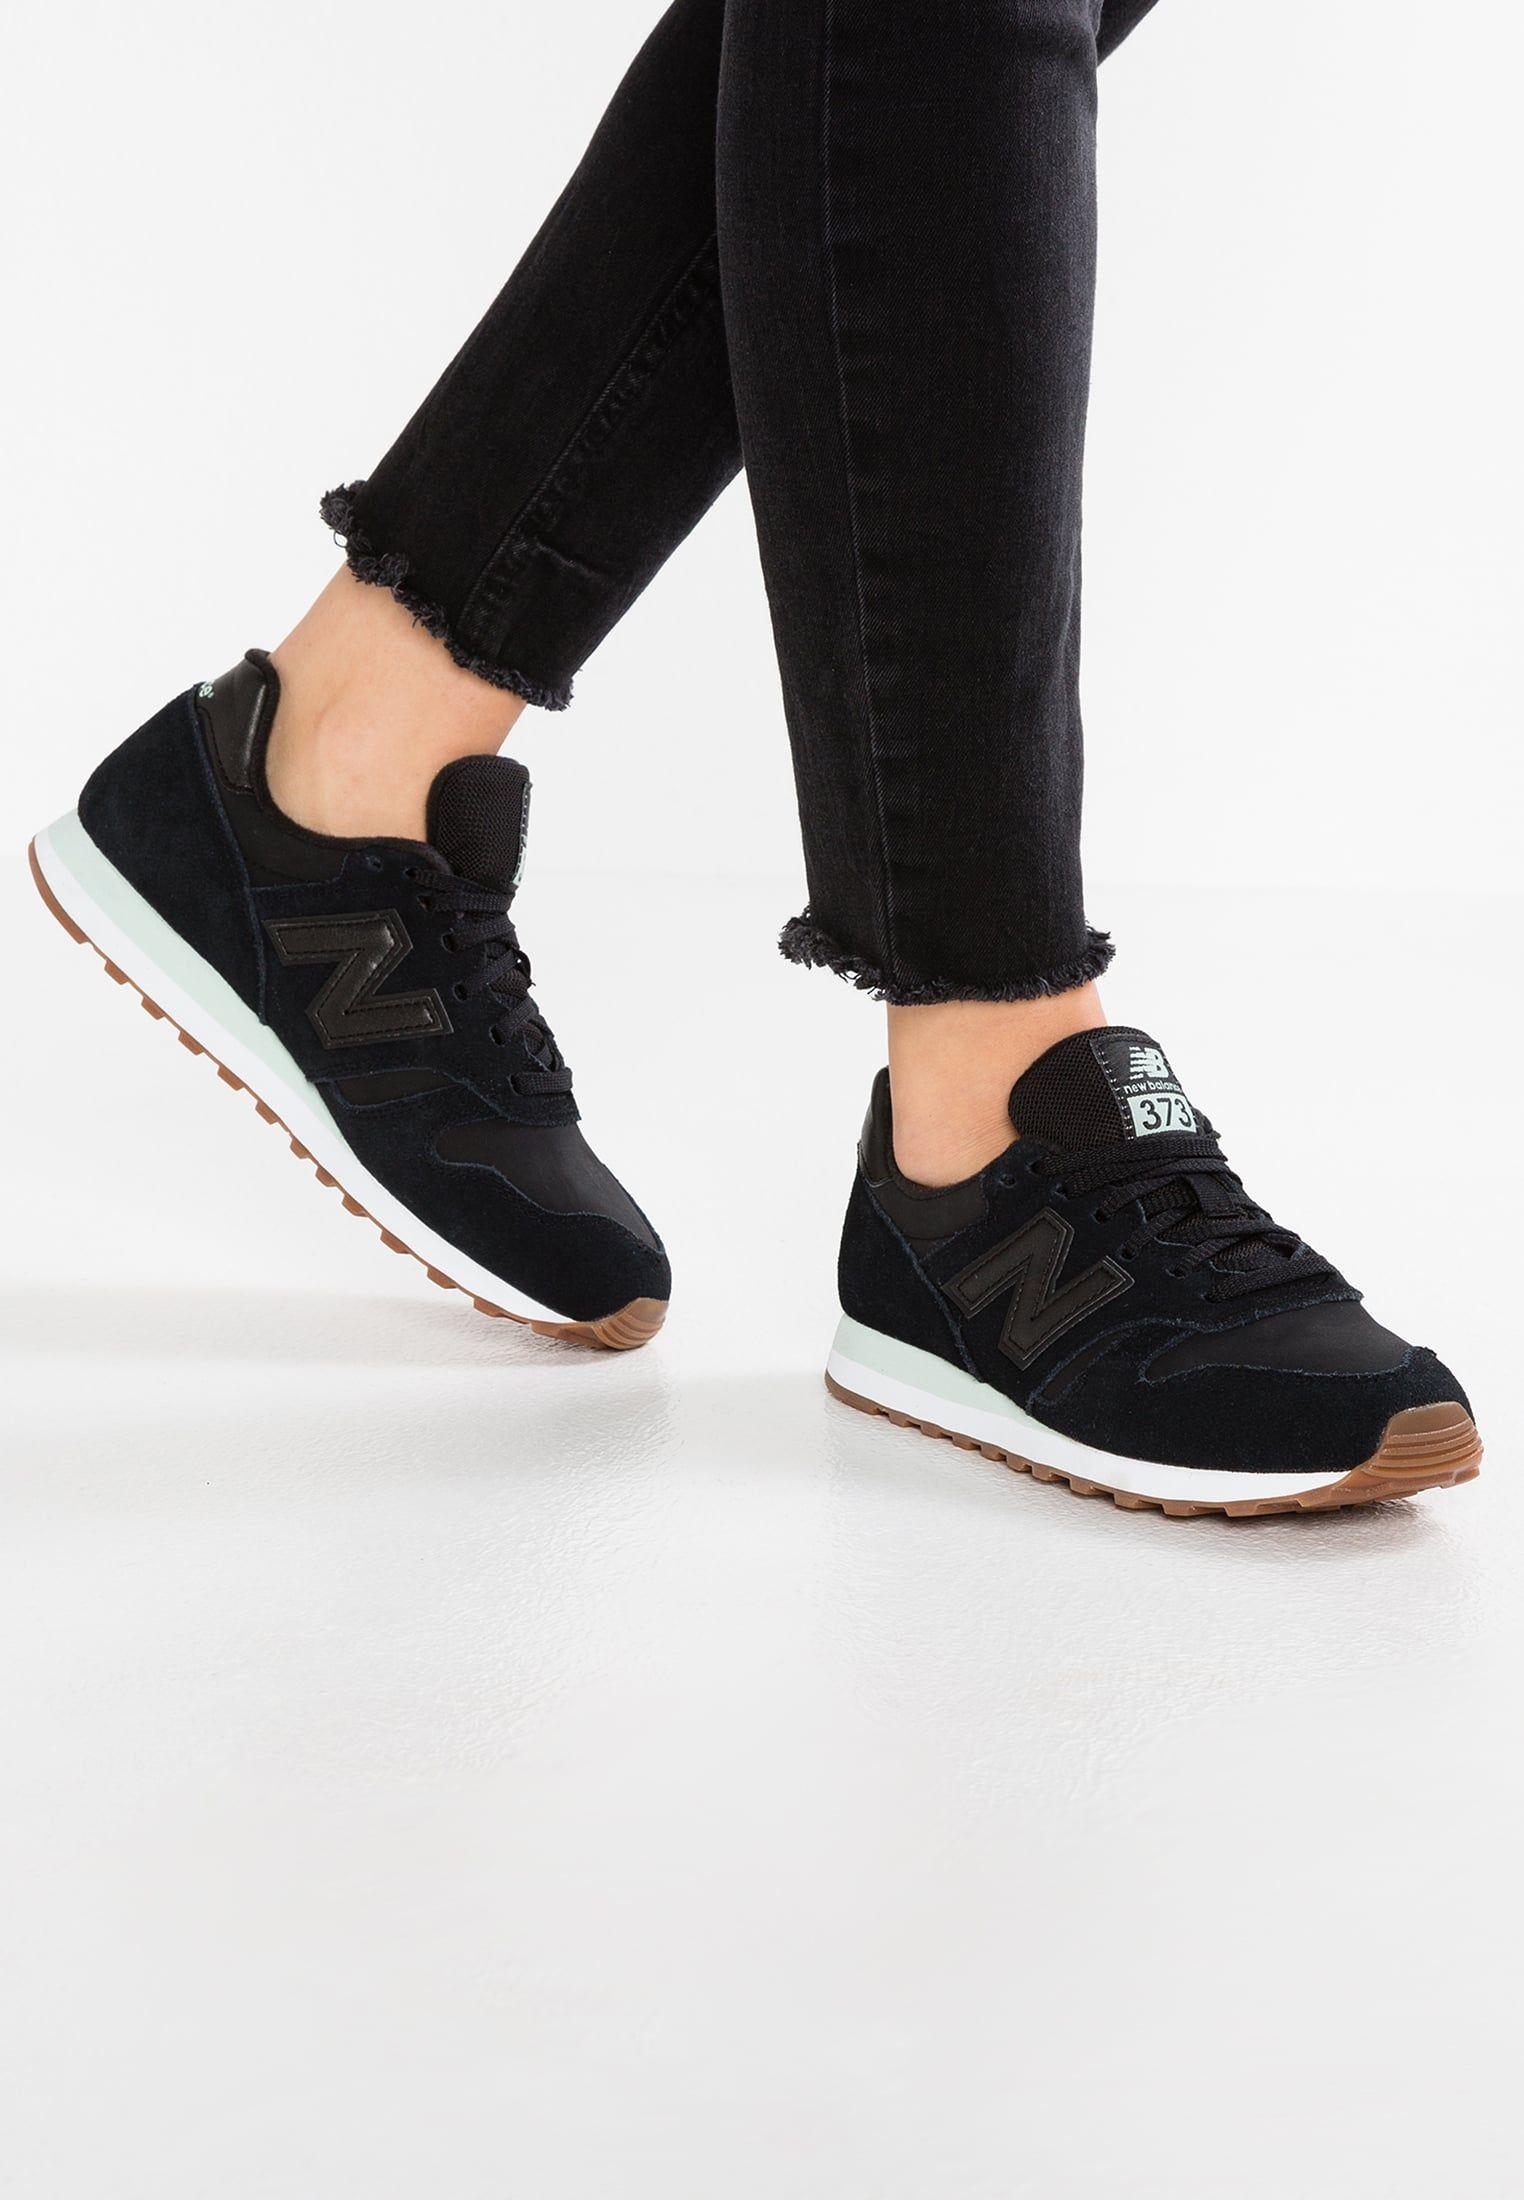 Wl373 Pinterest Sneakersy Wl373 Black Niskie Black Sneakersy Wl373 Niskie Sneakersy Pinterest rUAr6a